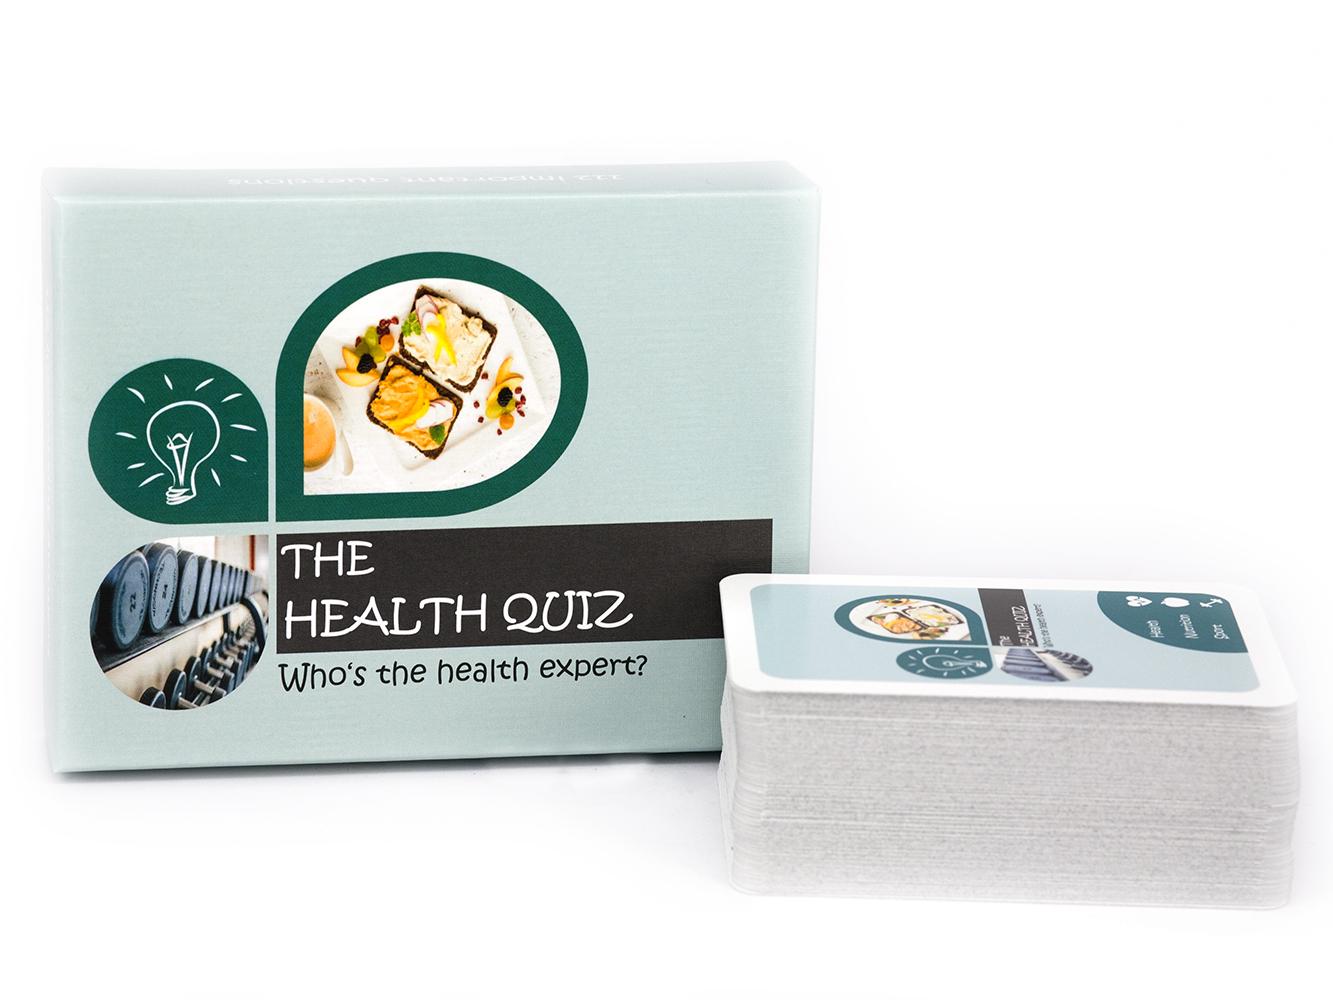 The health quiz